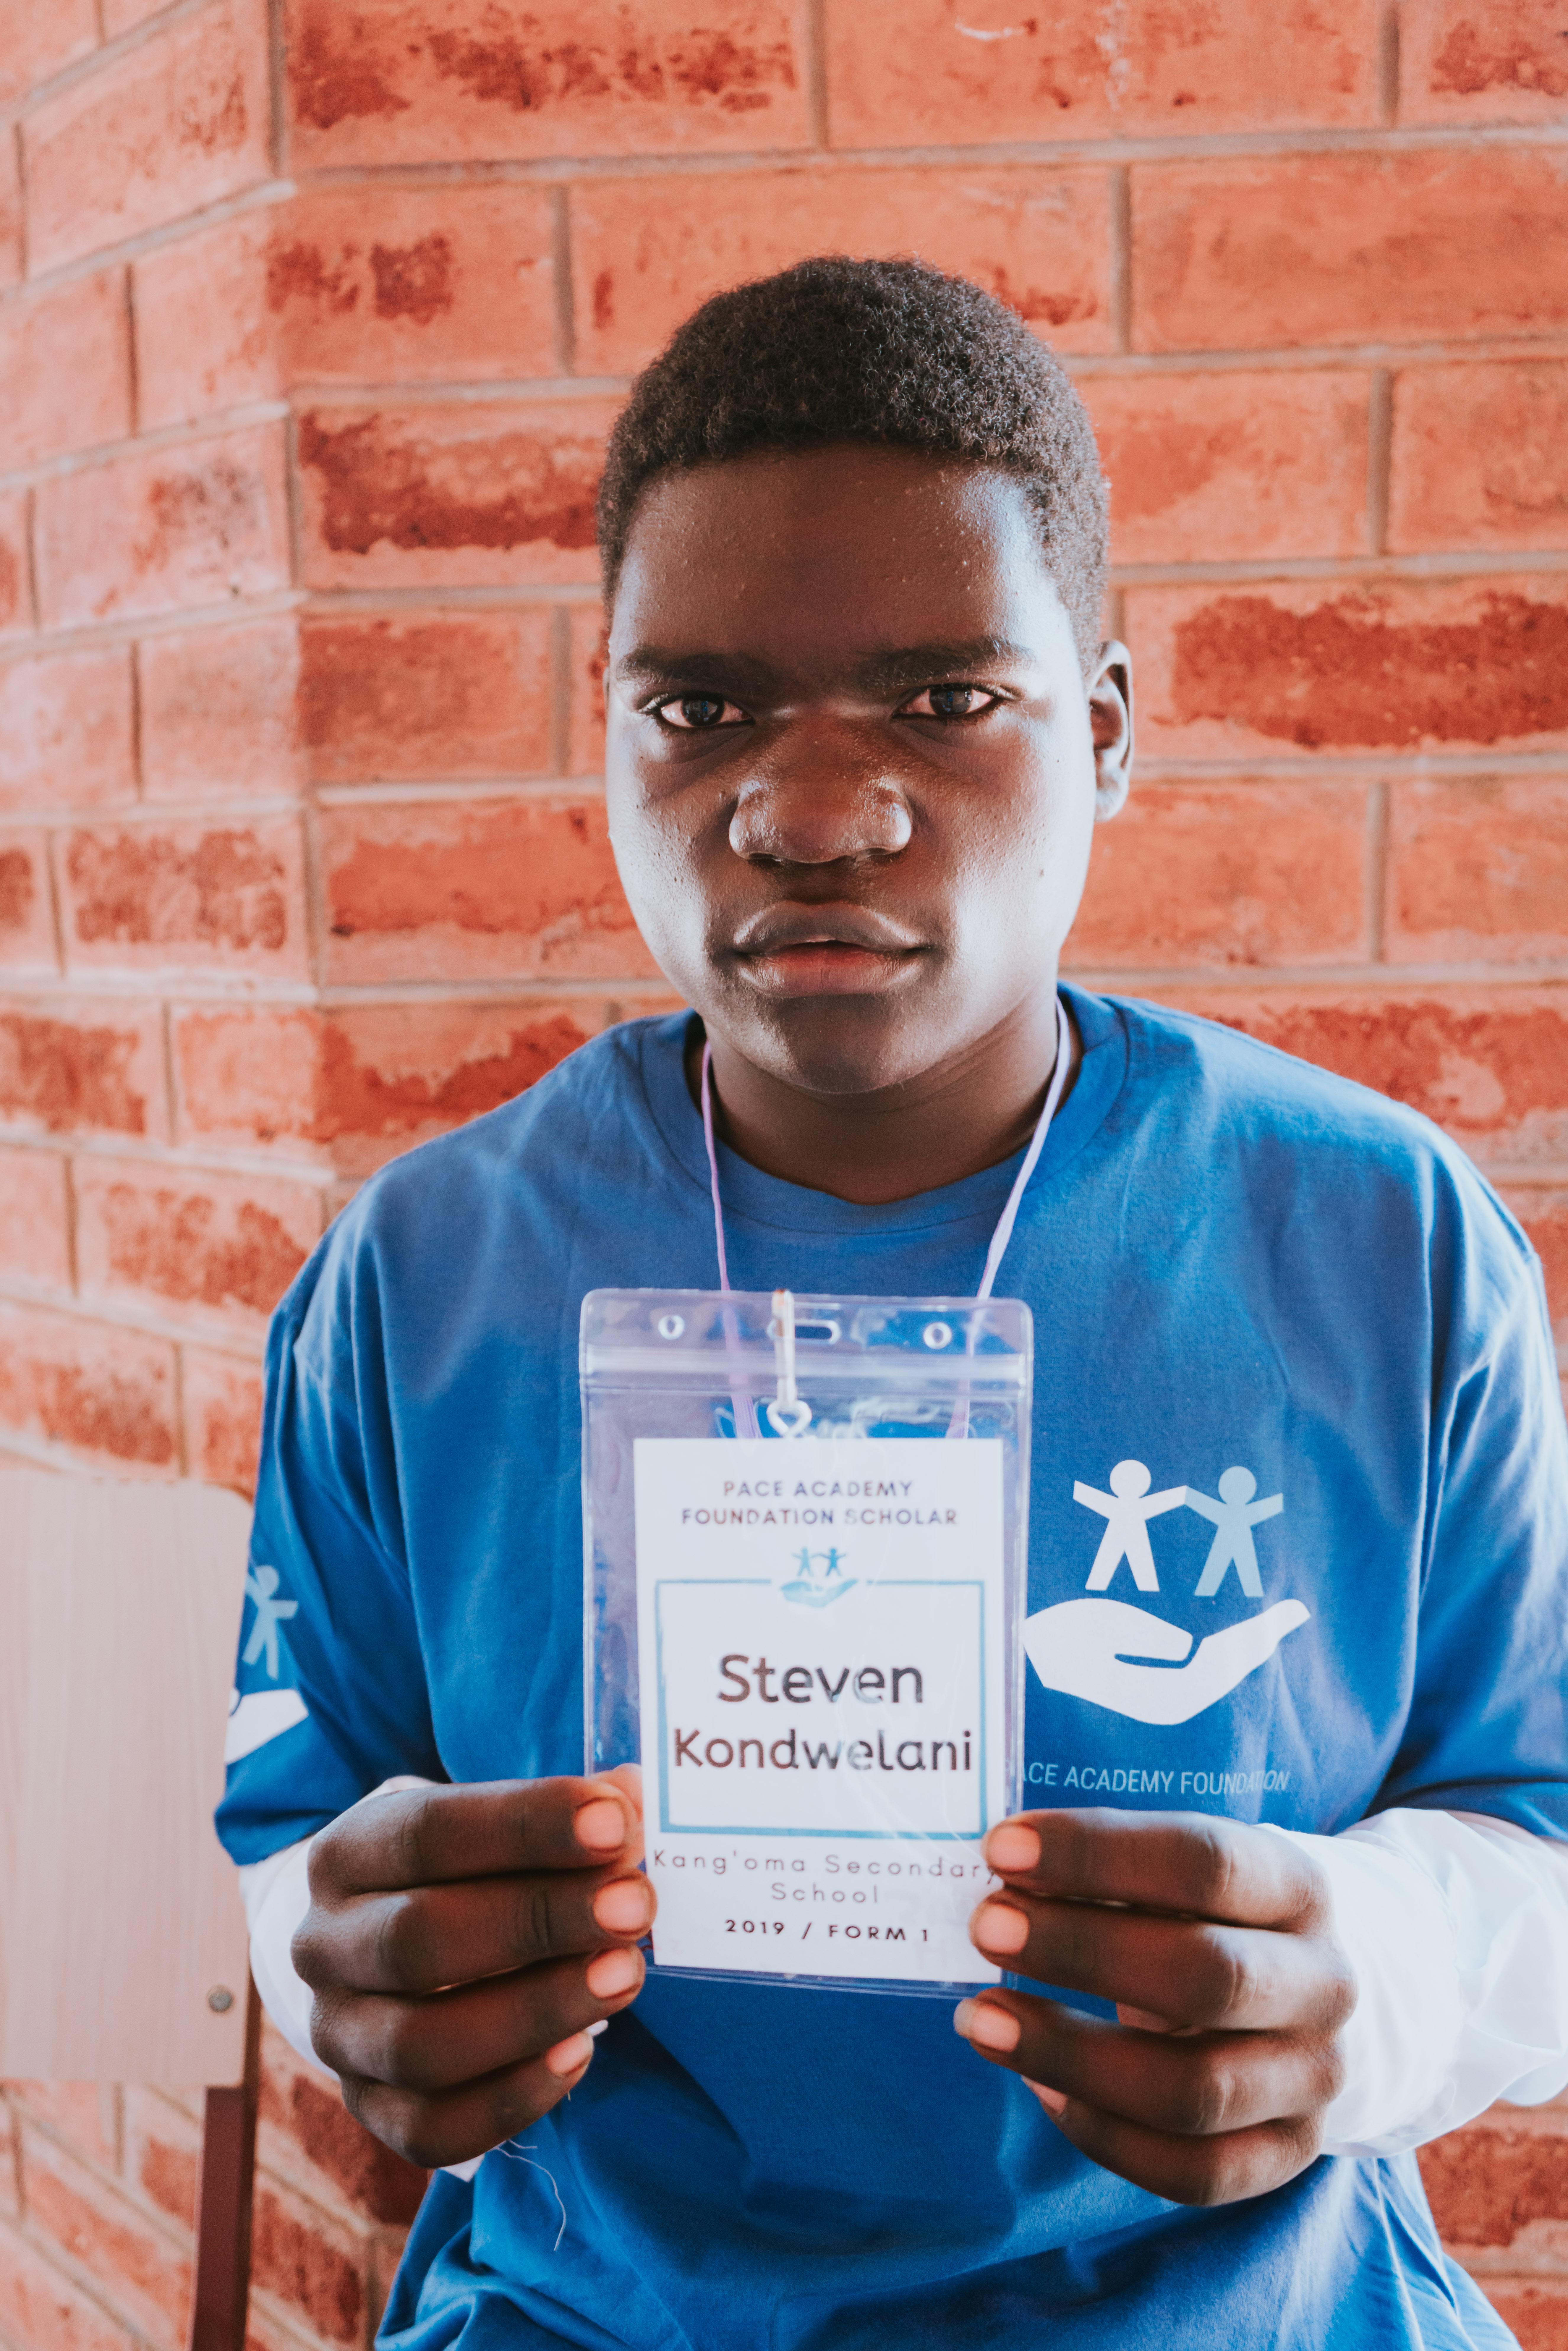 Steven Kondwelani (Kang'oma Secondary Sc